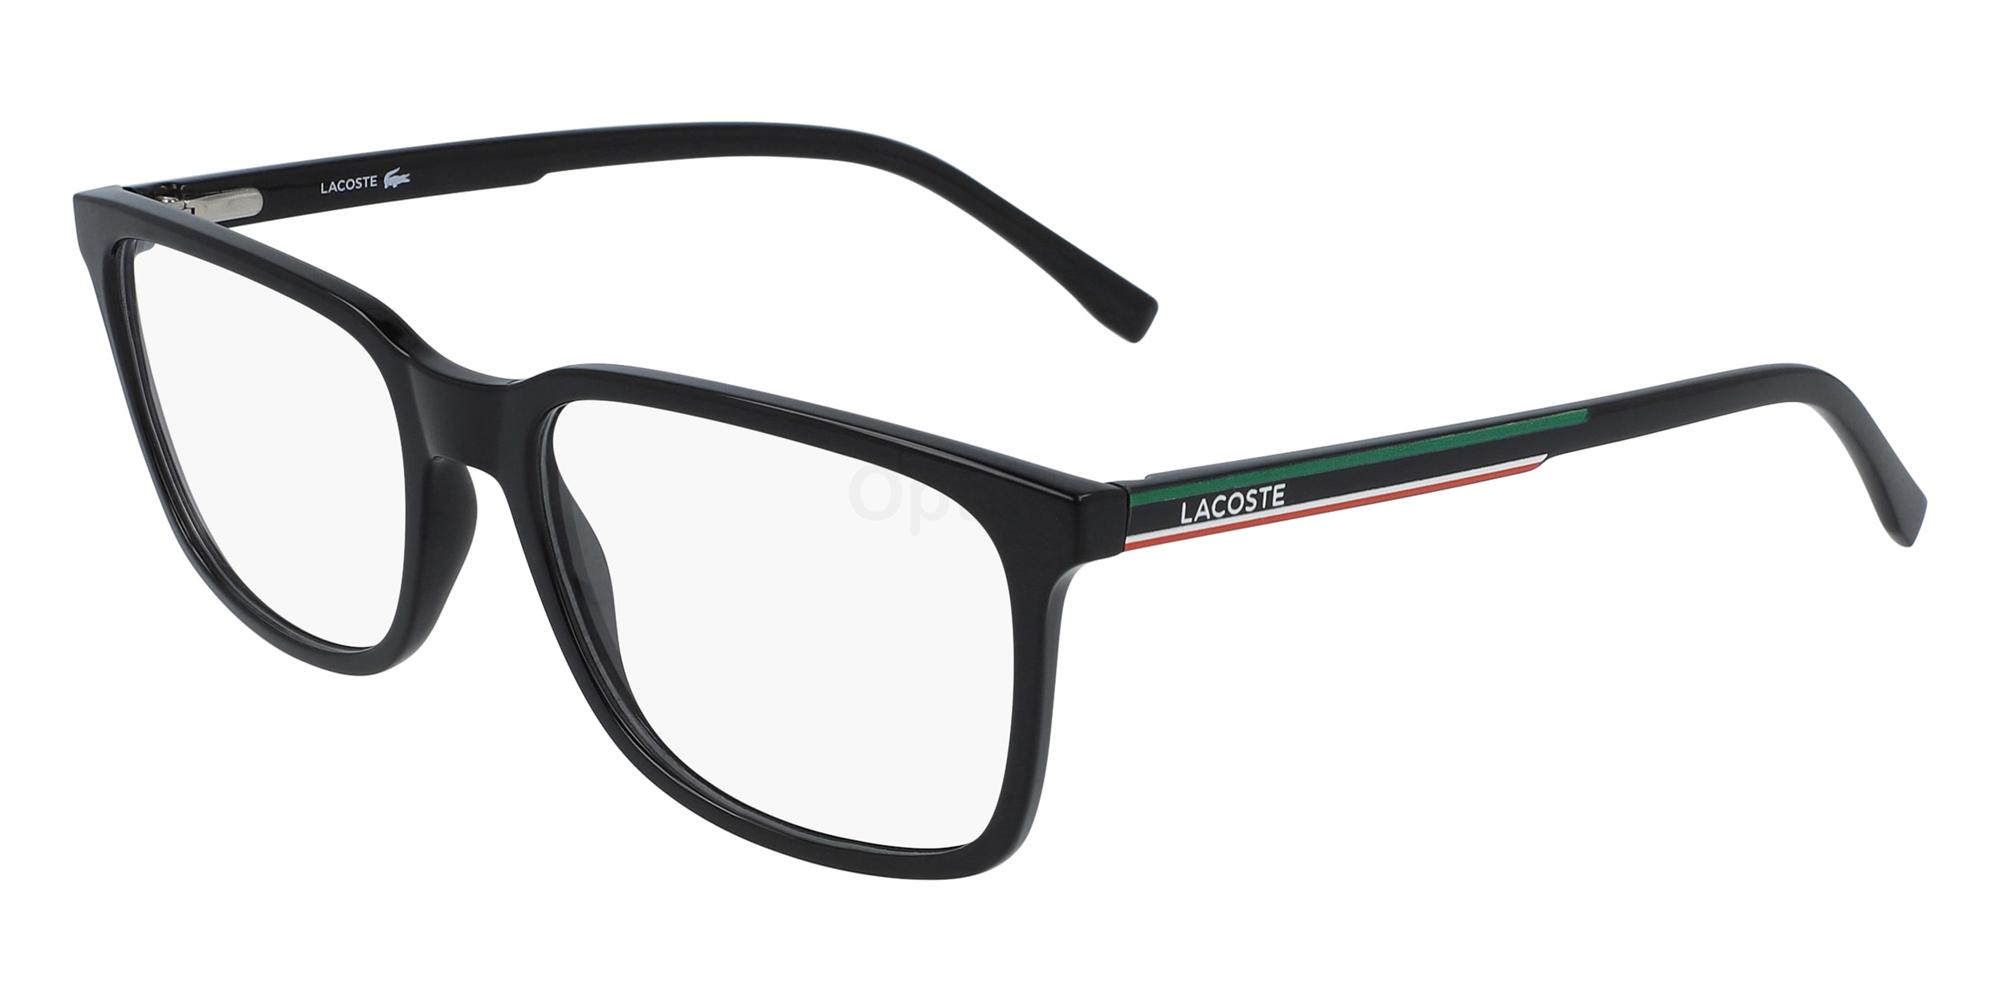 001 L2859 Glasses, Lacoste